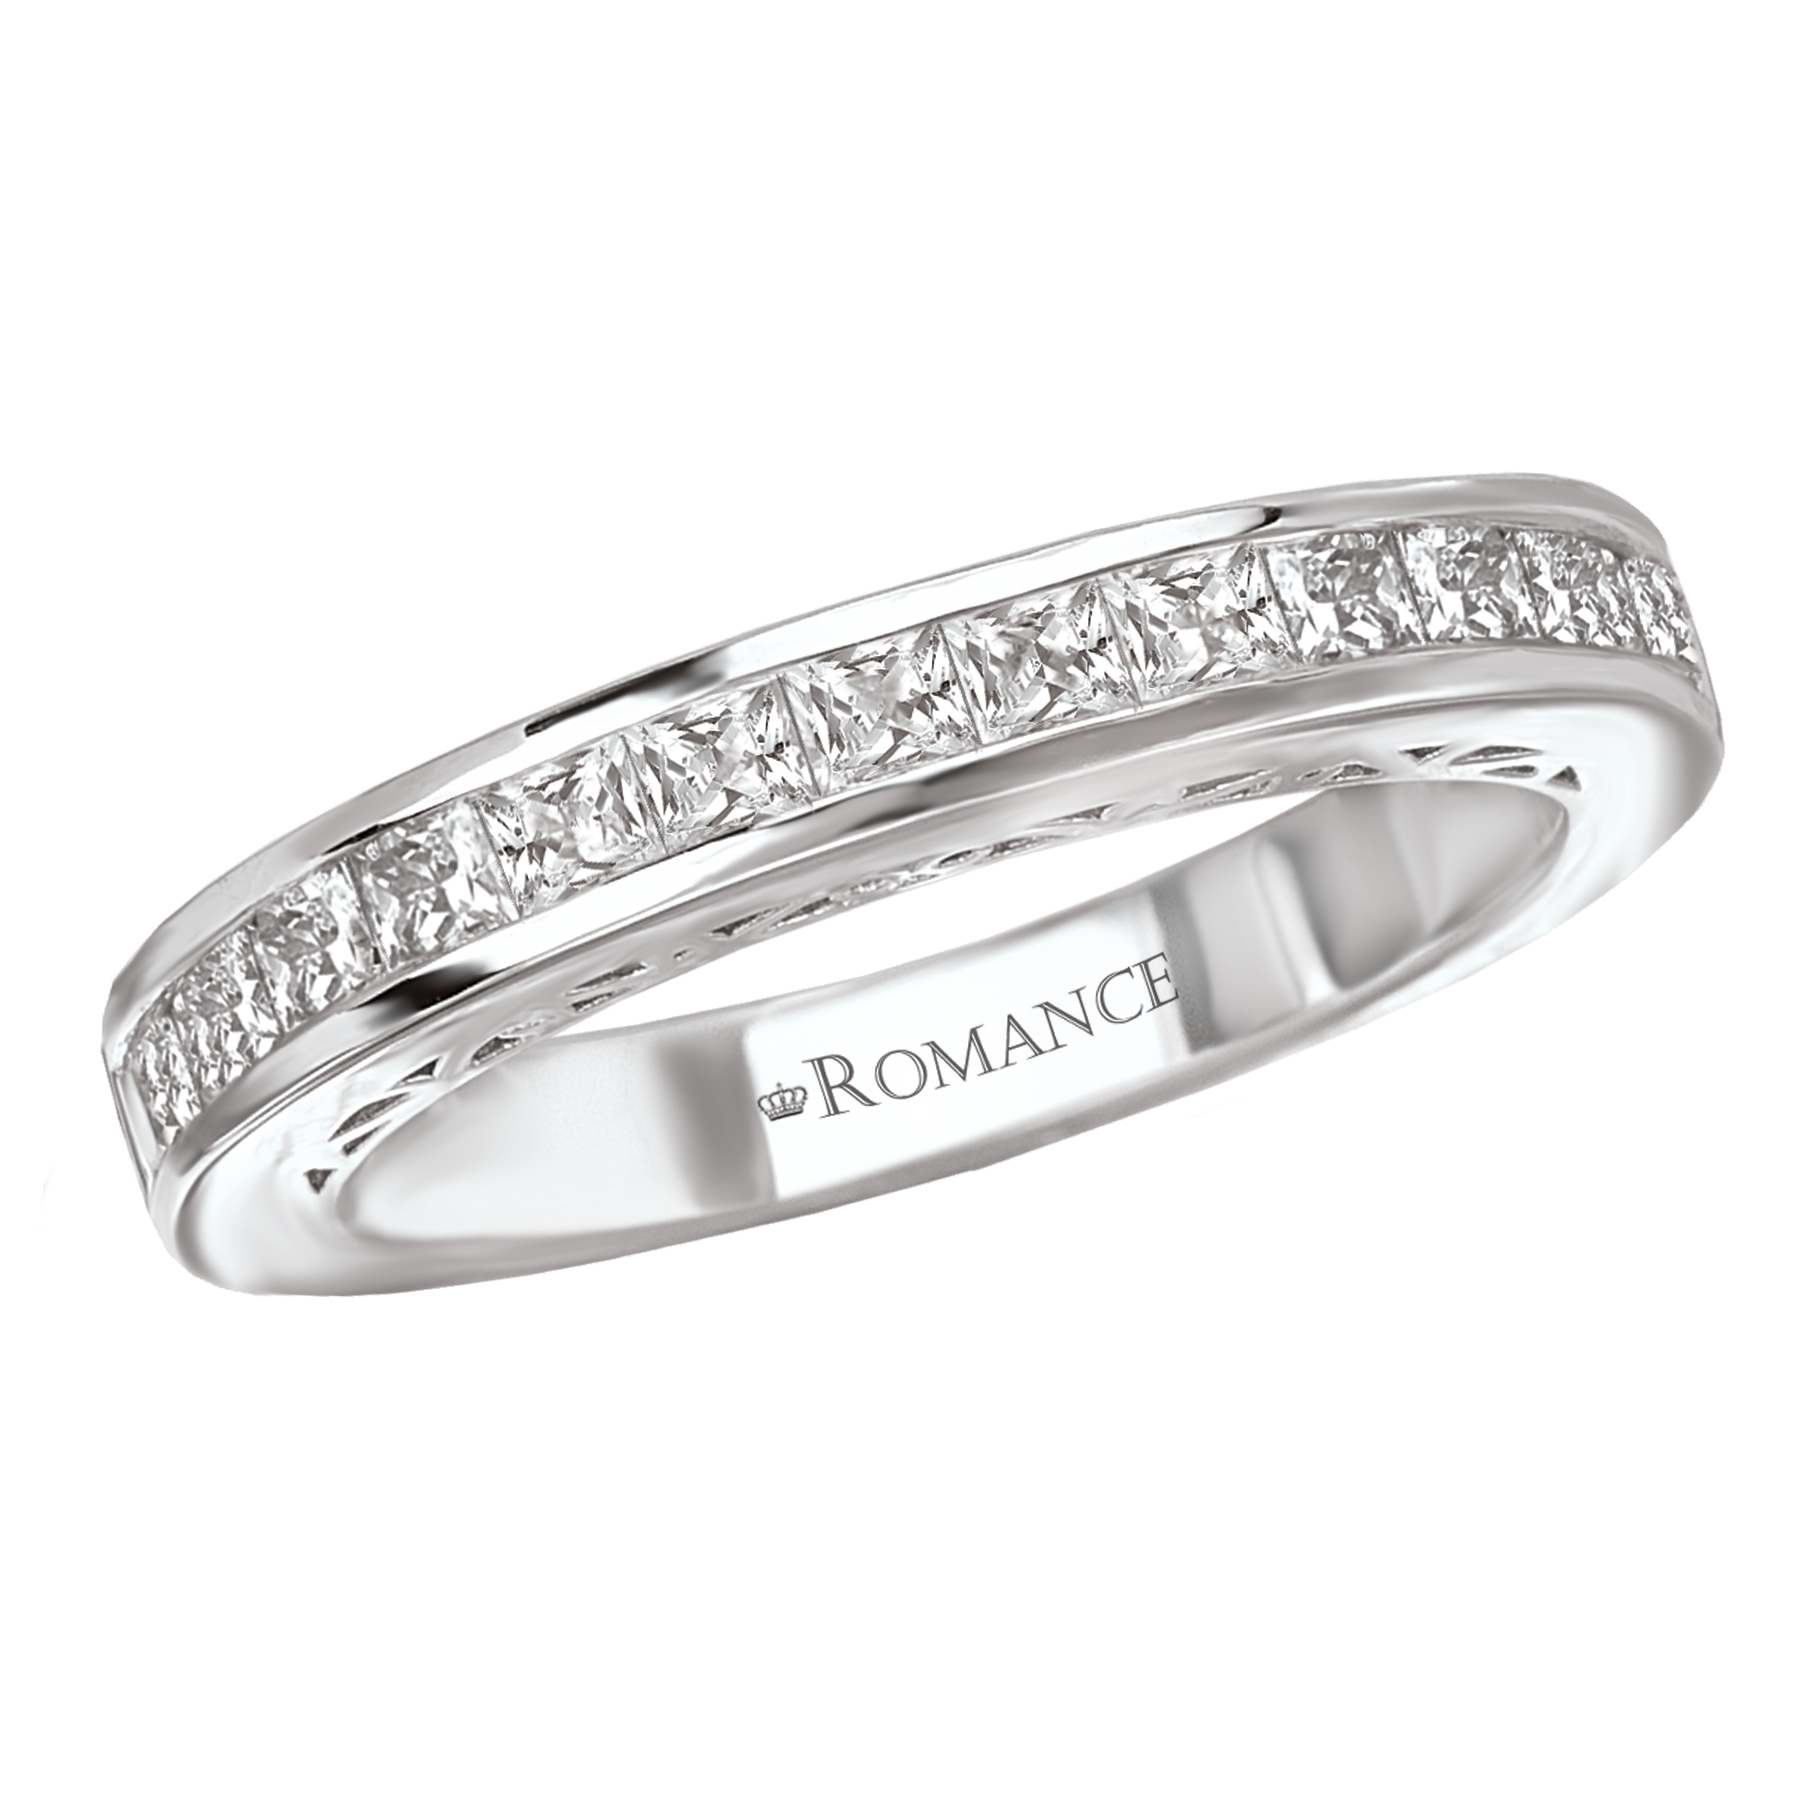 Romance Wedding Bands 117462-W product image